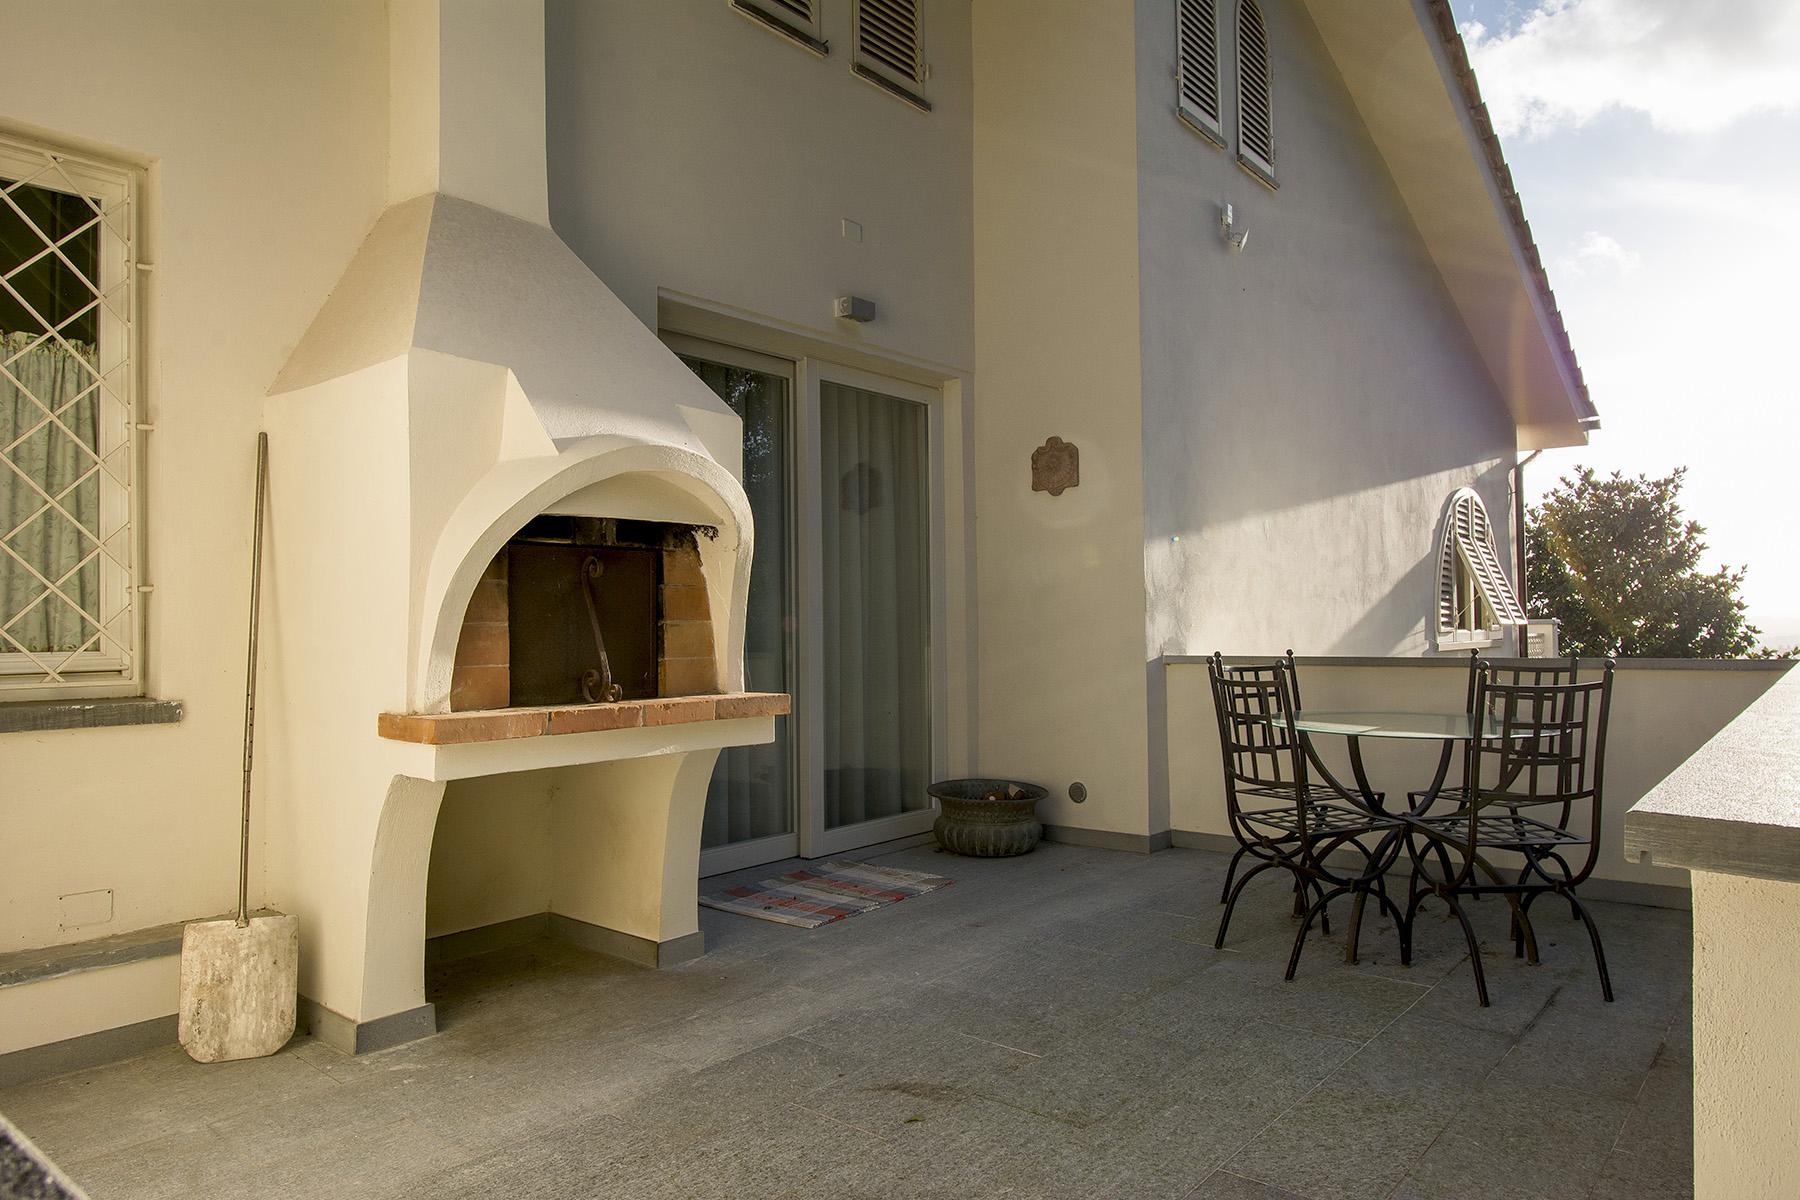 Villa in Vendita a Lucca: 5 locali, 470 mq - Foto 22